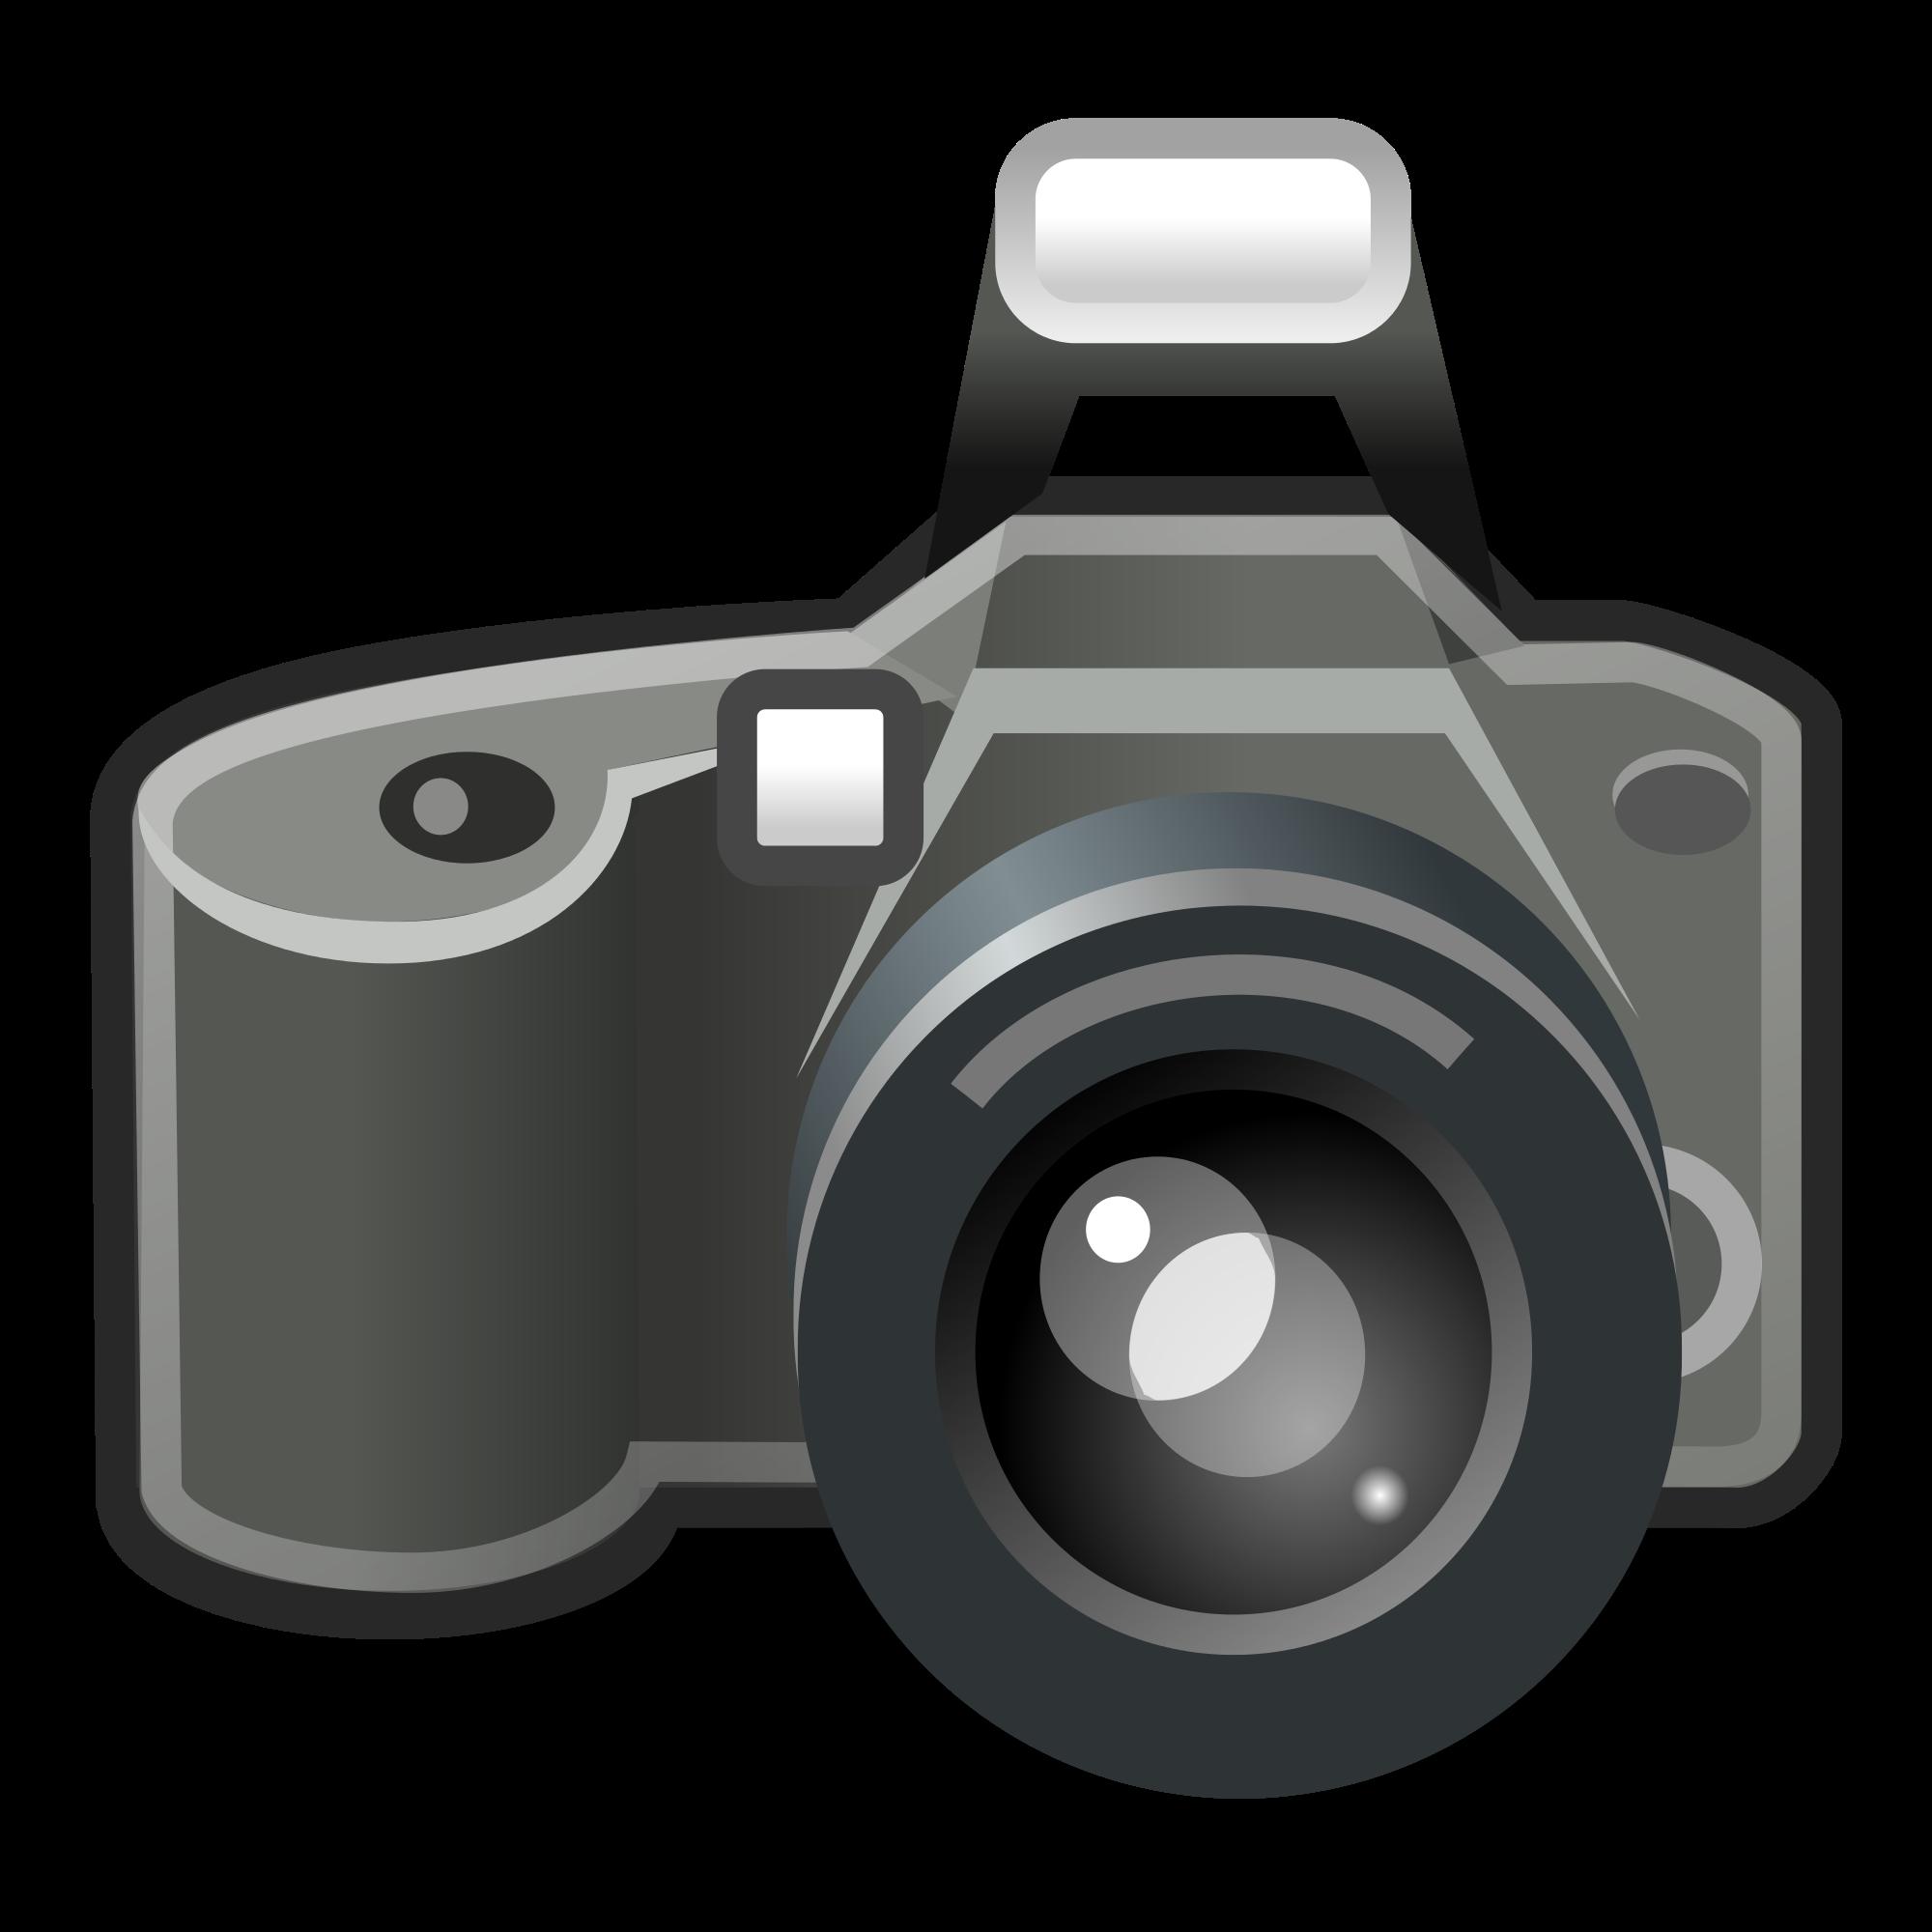 Clipart camera template. File photo svg wikimedia